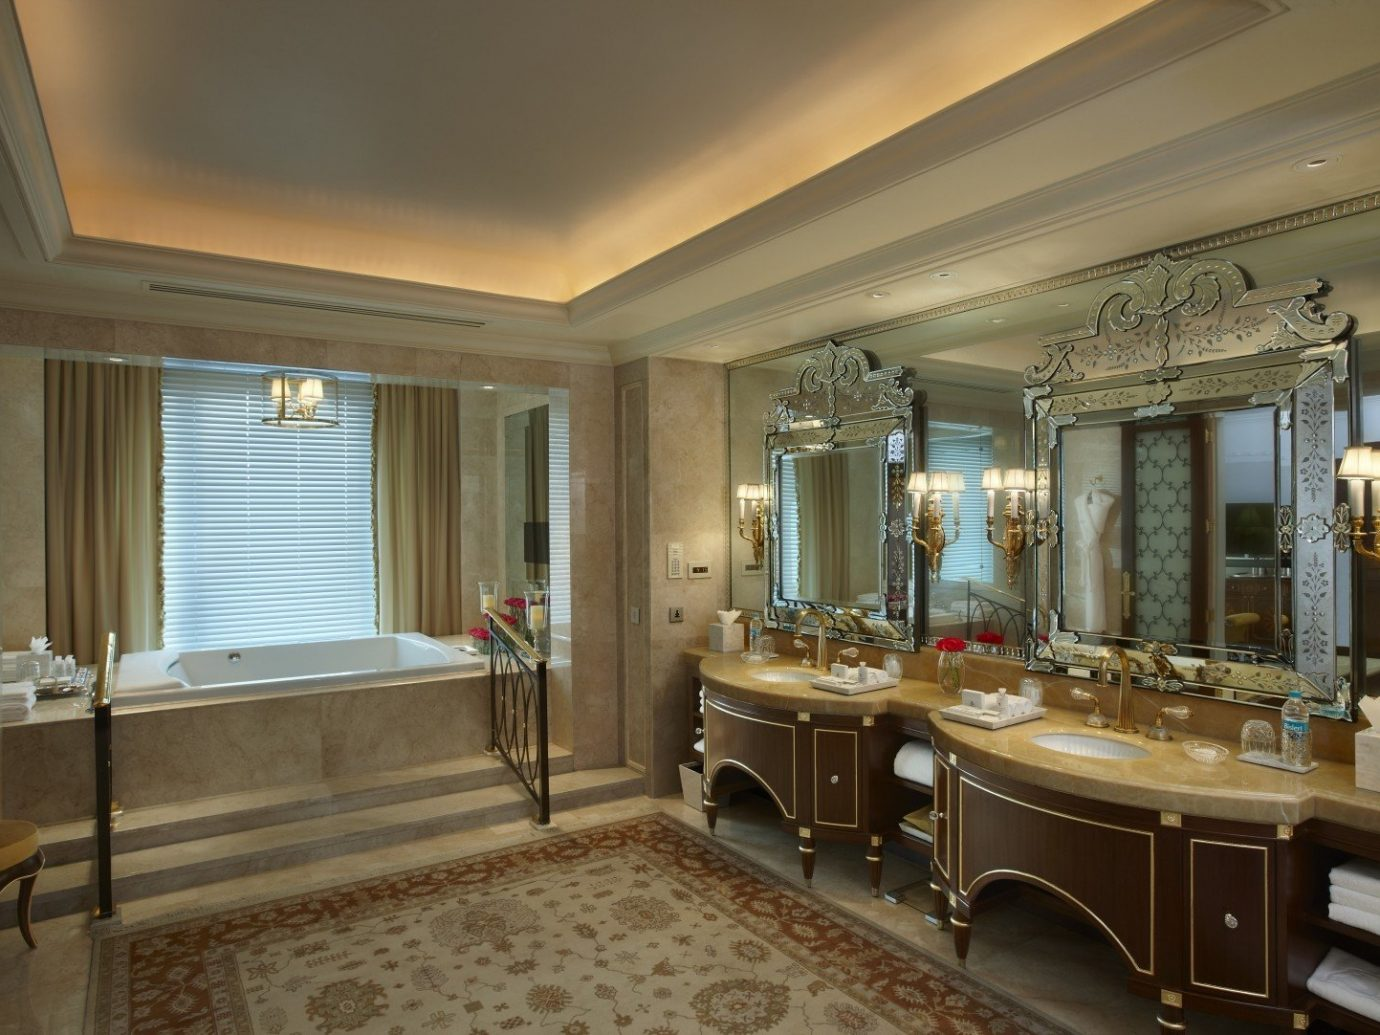 Hotels Luxury Travel Indoor Ceiling Floor Wall Window Room Interior Design Estate Bathroom Real Suite